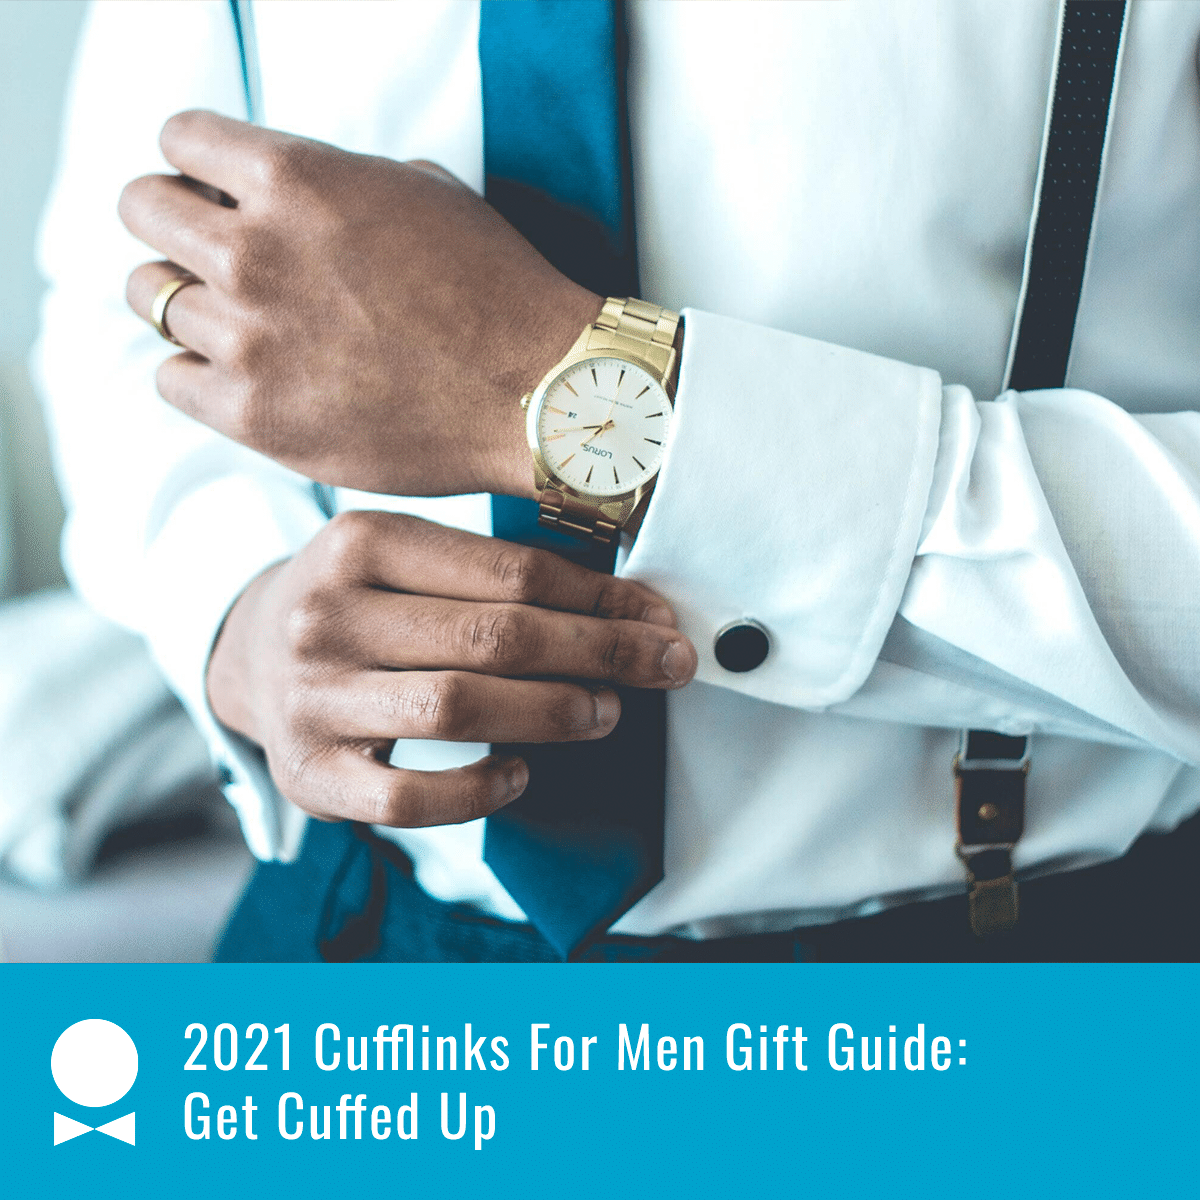 cufflink for men gift guide